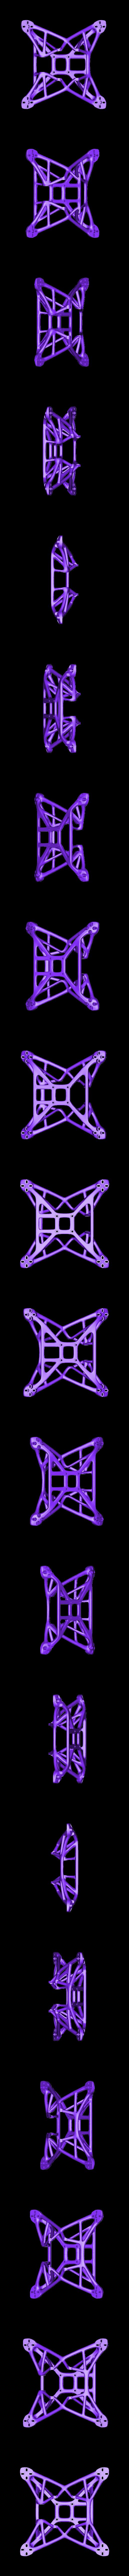 bionic frame mini.stl Download STL file Bionic frame 140mm • 3D print template, Rafraf199